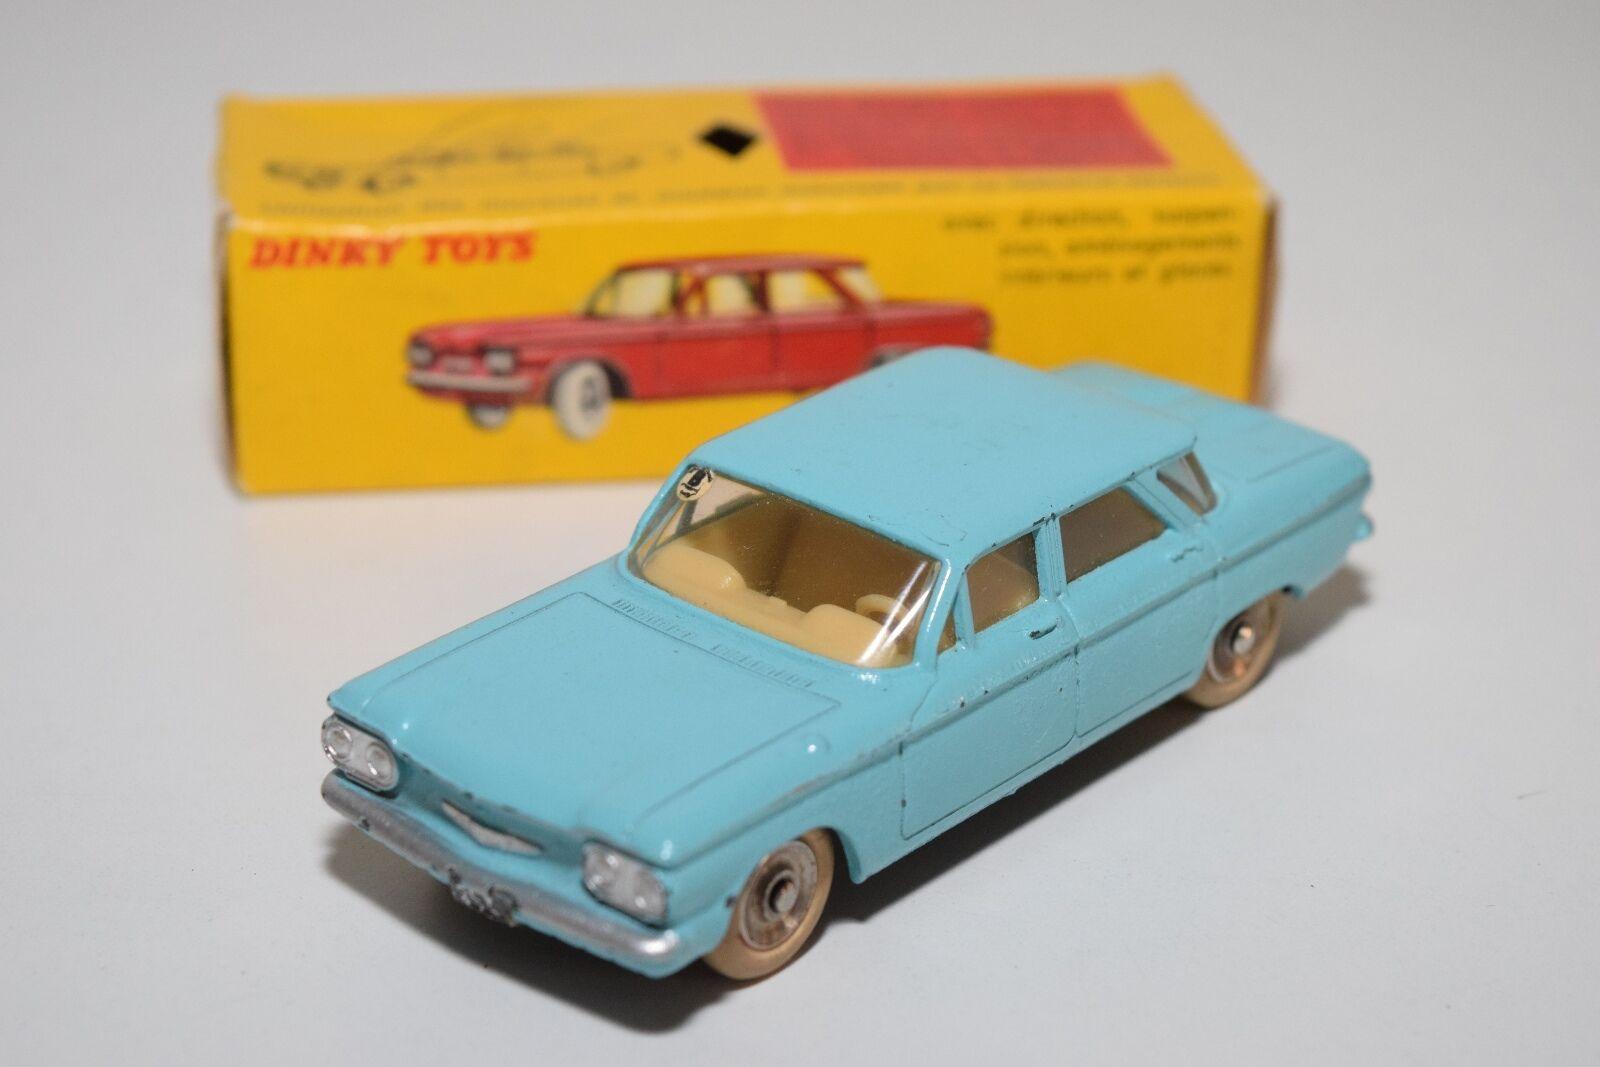 spedizione gratuita! F DINKY giocattoli 552 CHEVROLET CORVAIR CORVAIR CORVAIR LIGHT blu EXCELLENT scatolaED  salutare